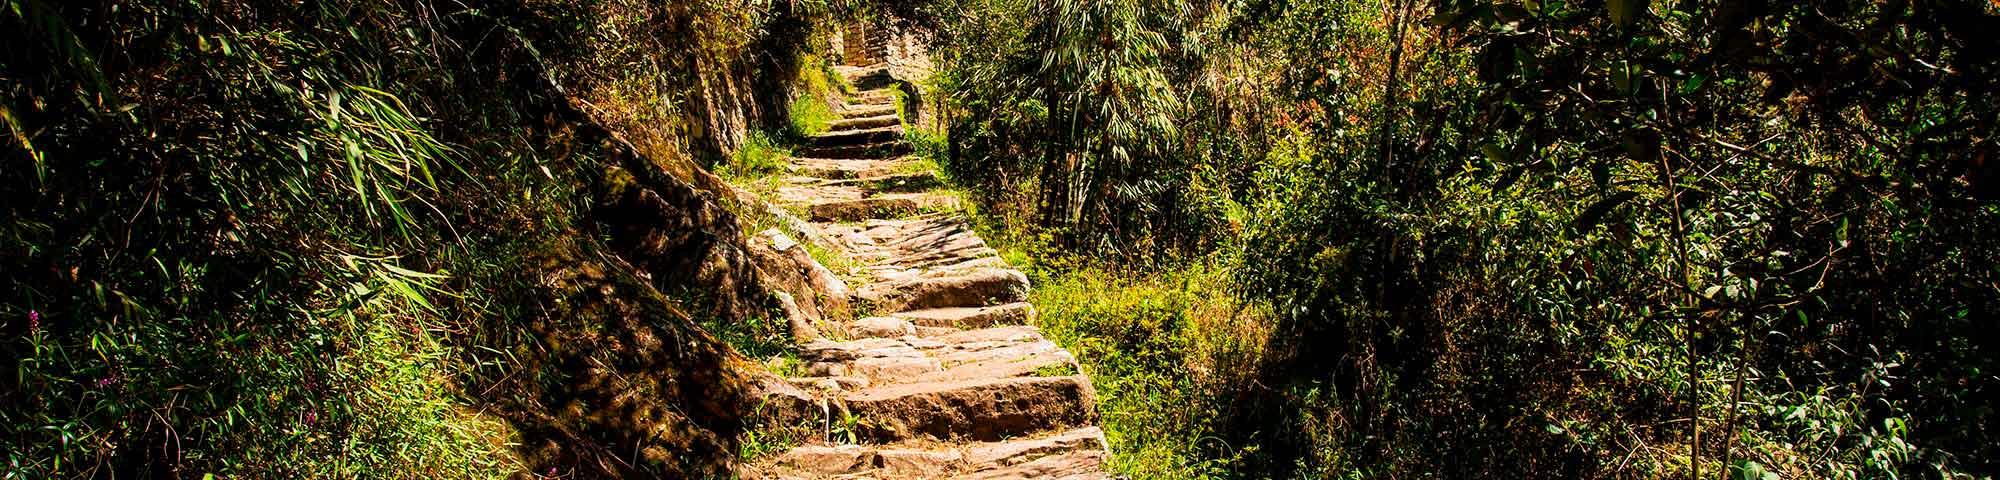 View Perú: reapertura Camino Inca el 15 de julio